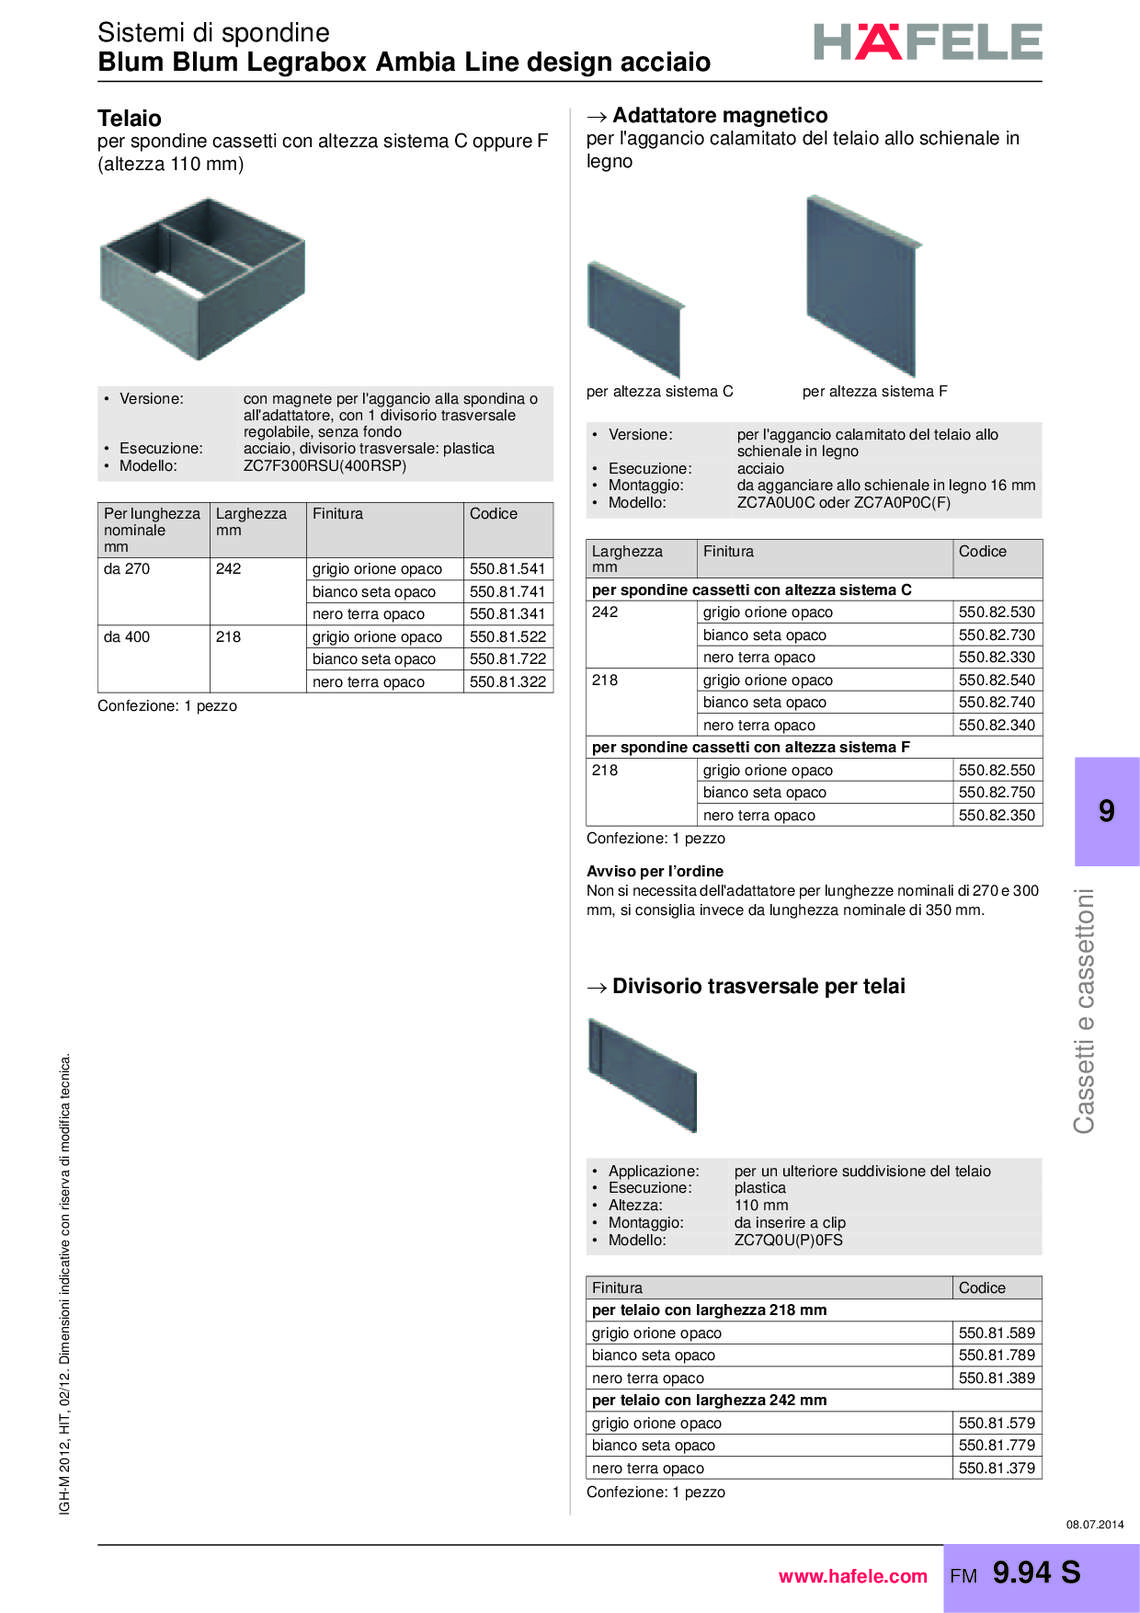 hafele-spondine-e-guide-per-mobili_40_136.jpg